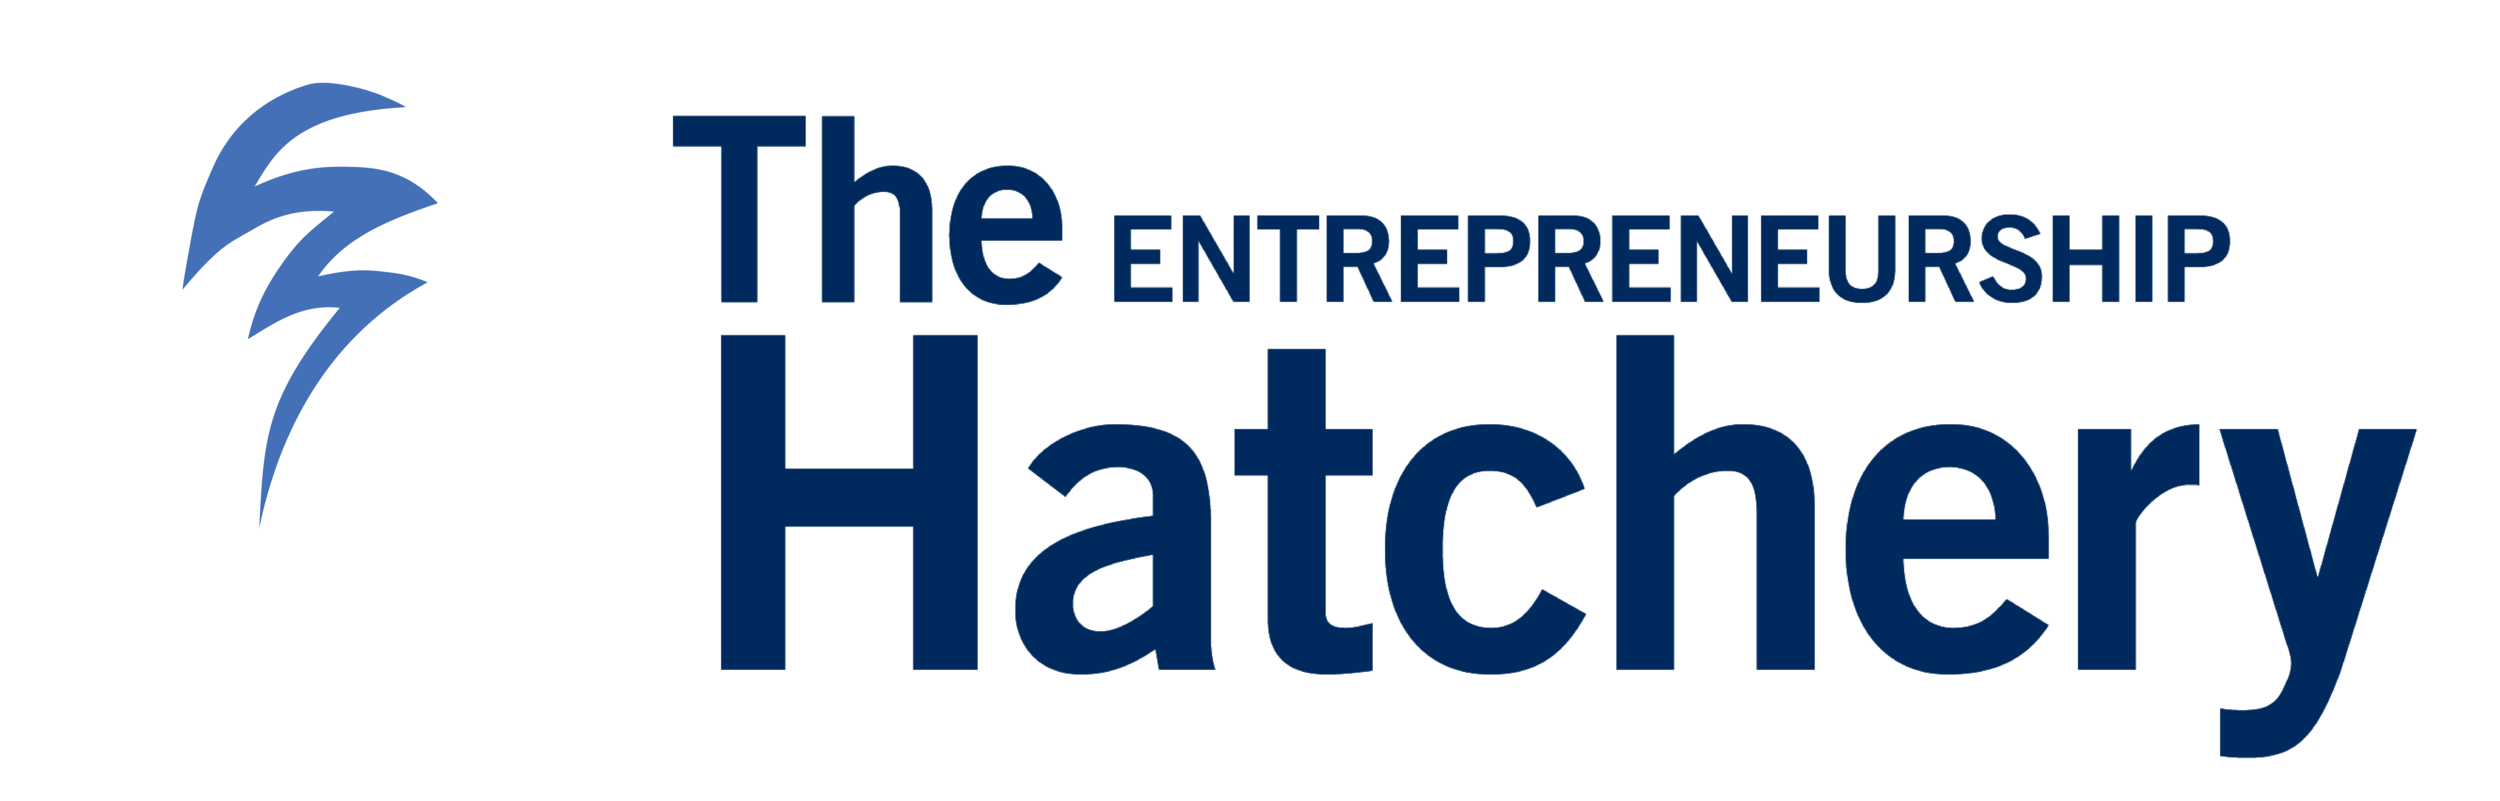 Hatchery Logo.png